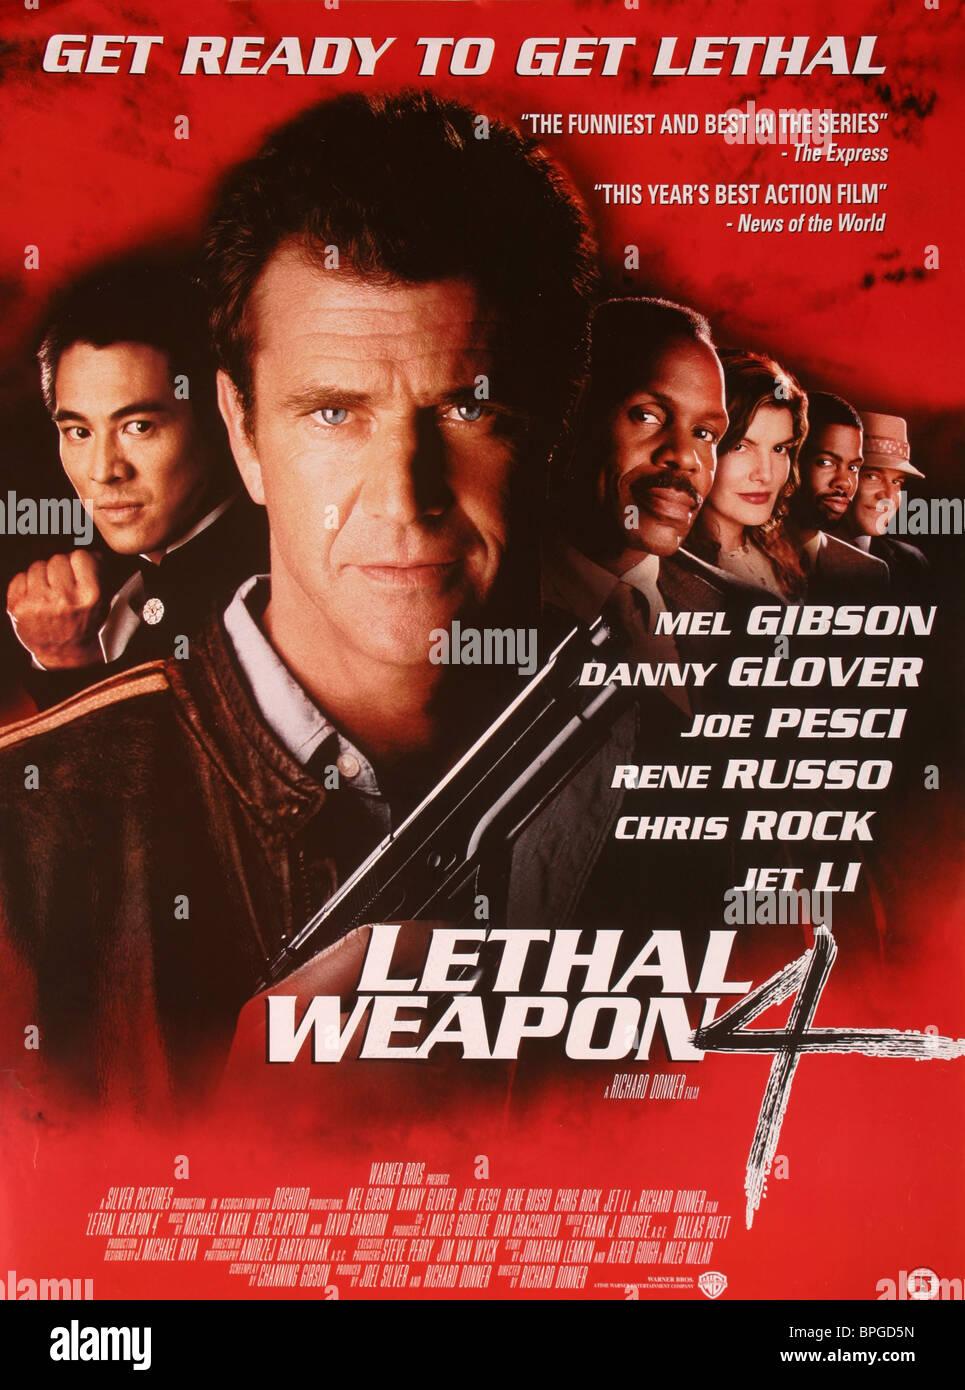 Jet Li Mel Gibson Danny Glover Rene Russo Chris Rock Joe Pesci Stock Photo Alamy